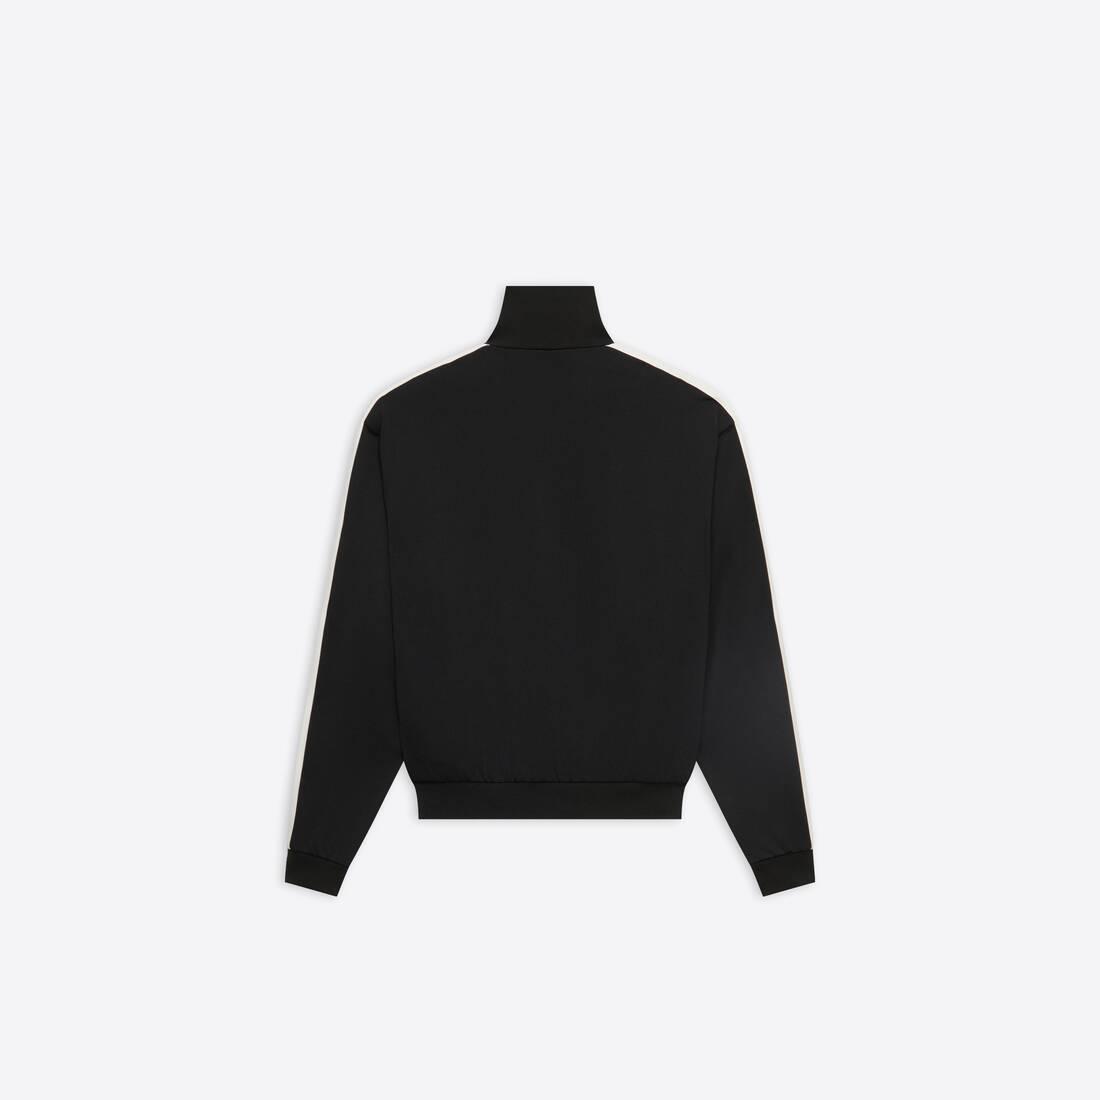 Display zoomed version of zip-up jacket 2